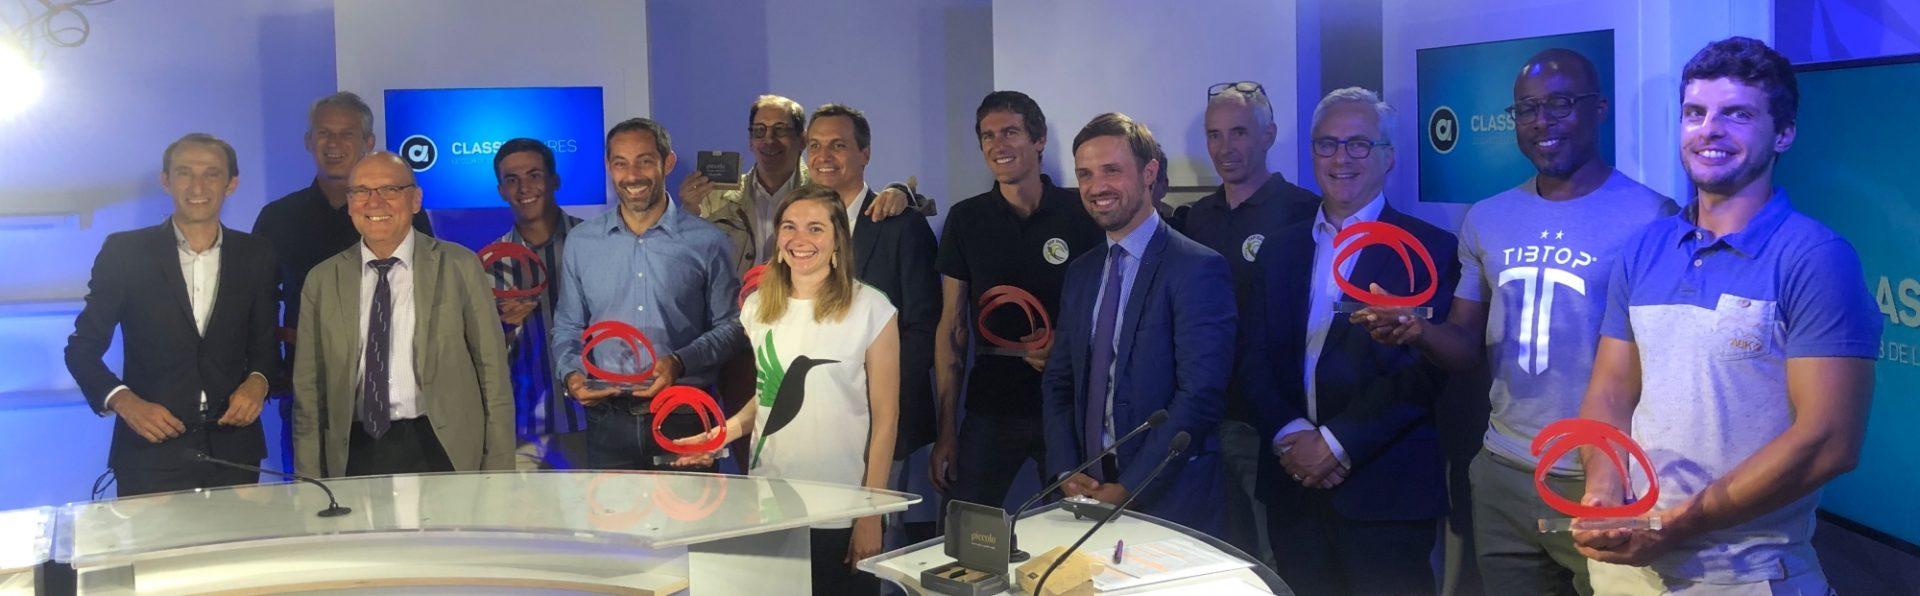 laureats concours inosport telegrenoble